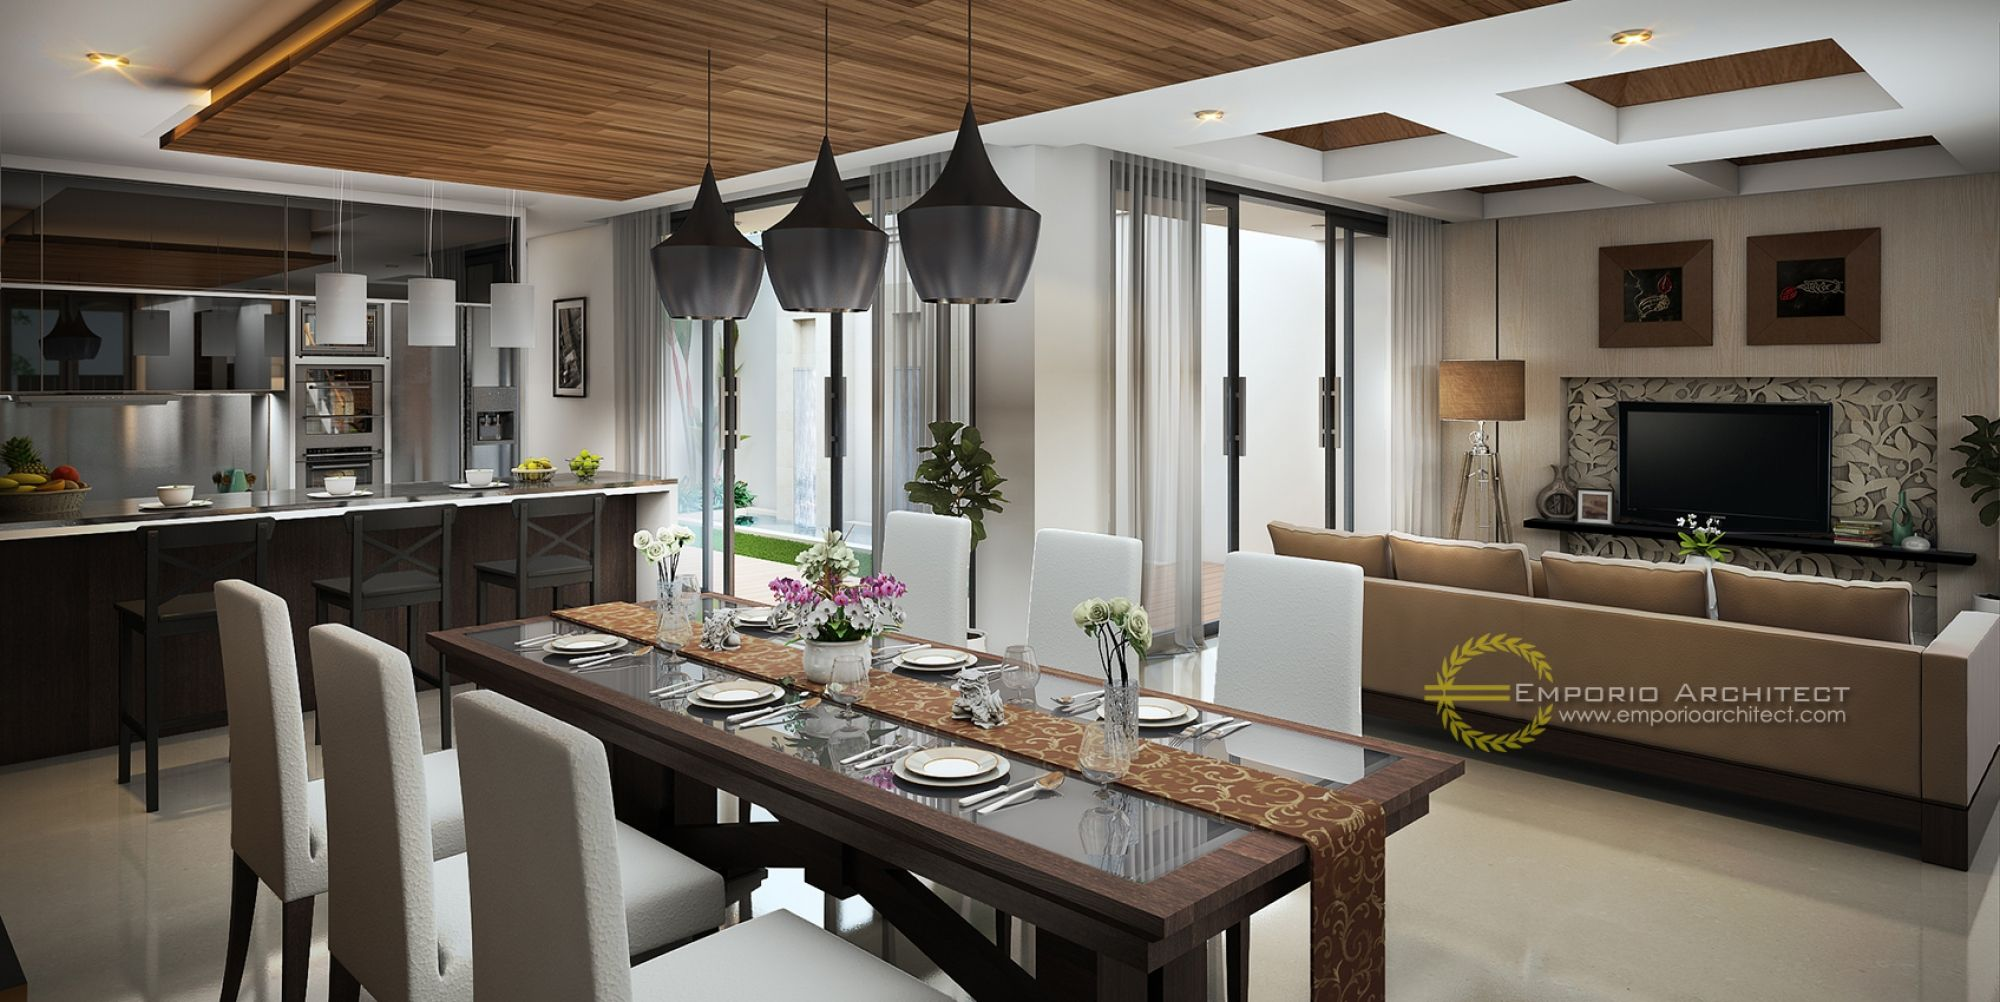 Jasa Arsitek Desain Rumah Bapak AJi